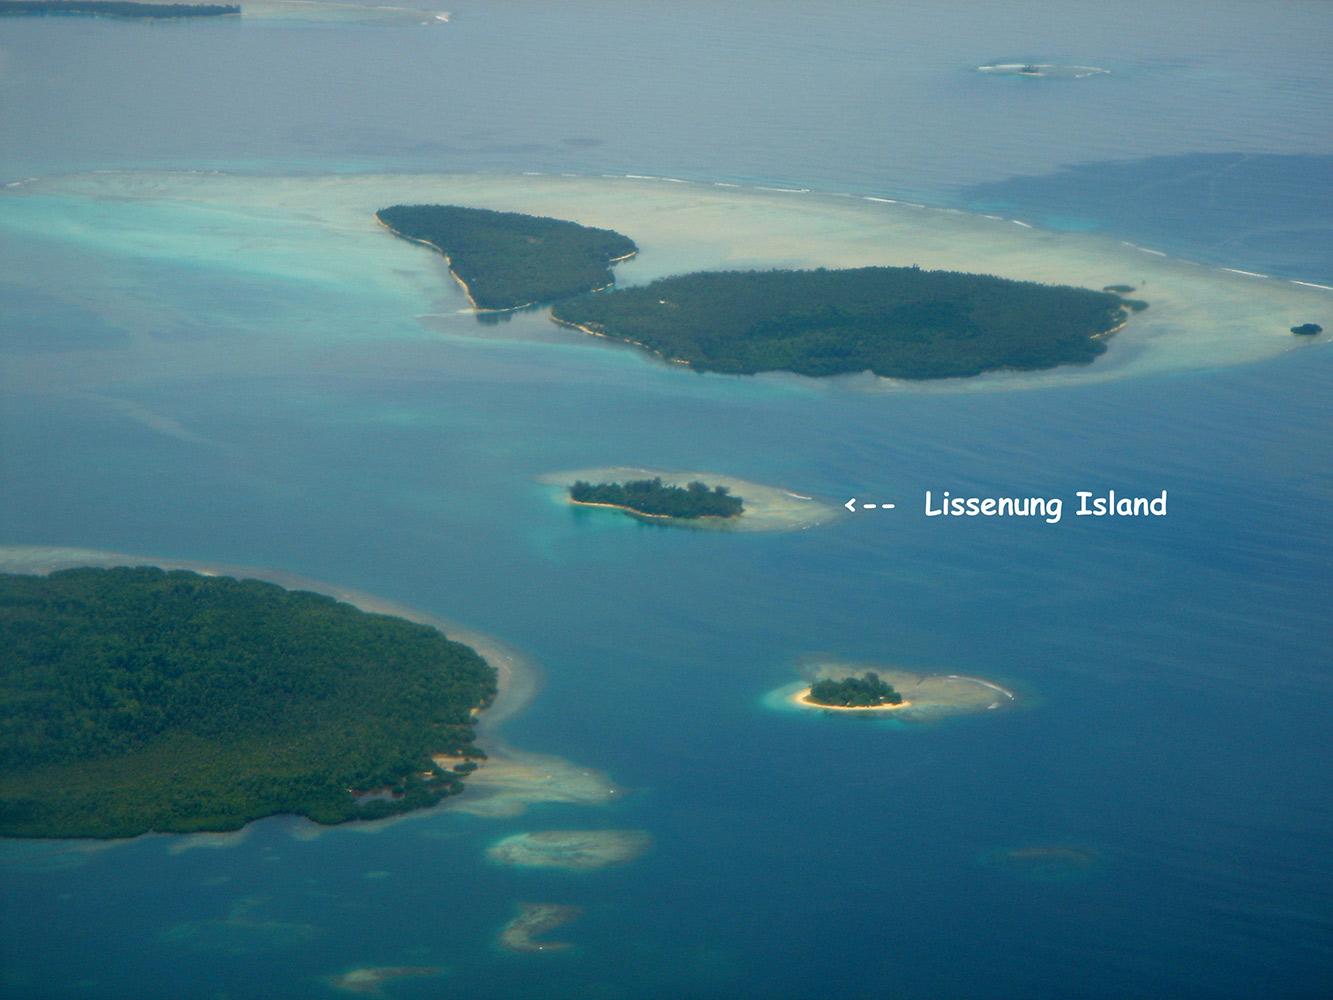 lissenung_island_resort_001